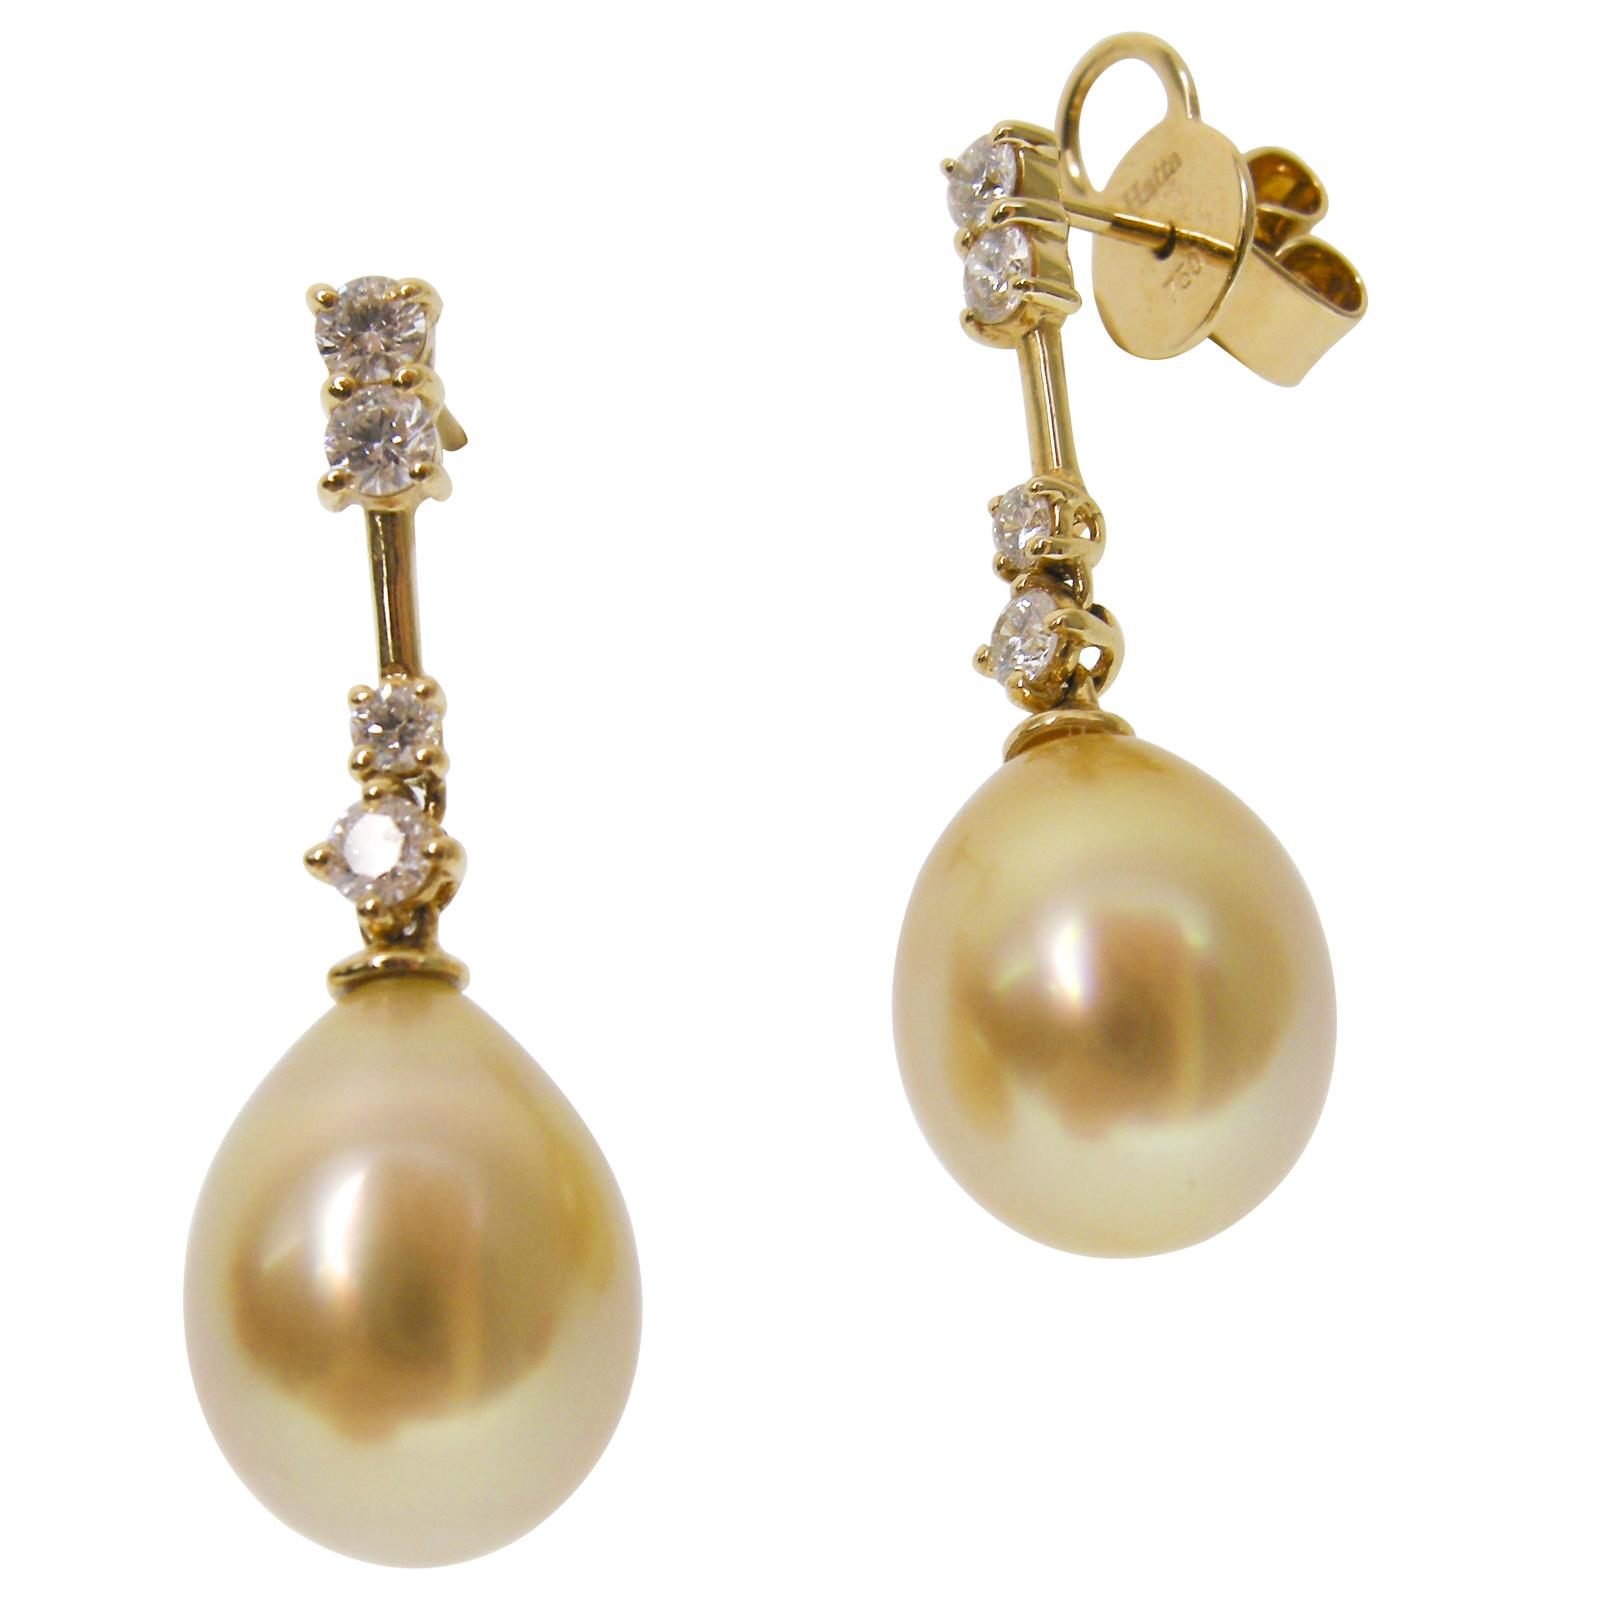 GOLDEN PEARL DROP & DIAMOND EARRINGS CLUSTER DIAMOND PENDANT BESPOKE FINE JEWELLERY BY SHAHINA HATTA